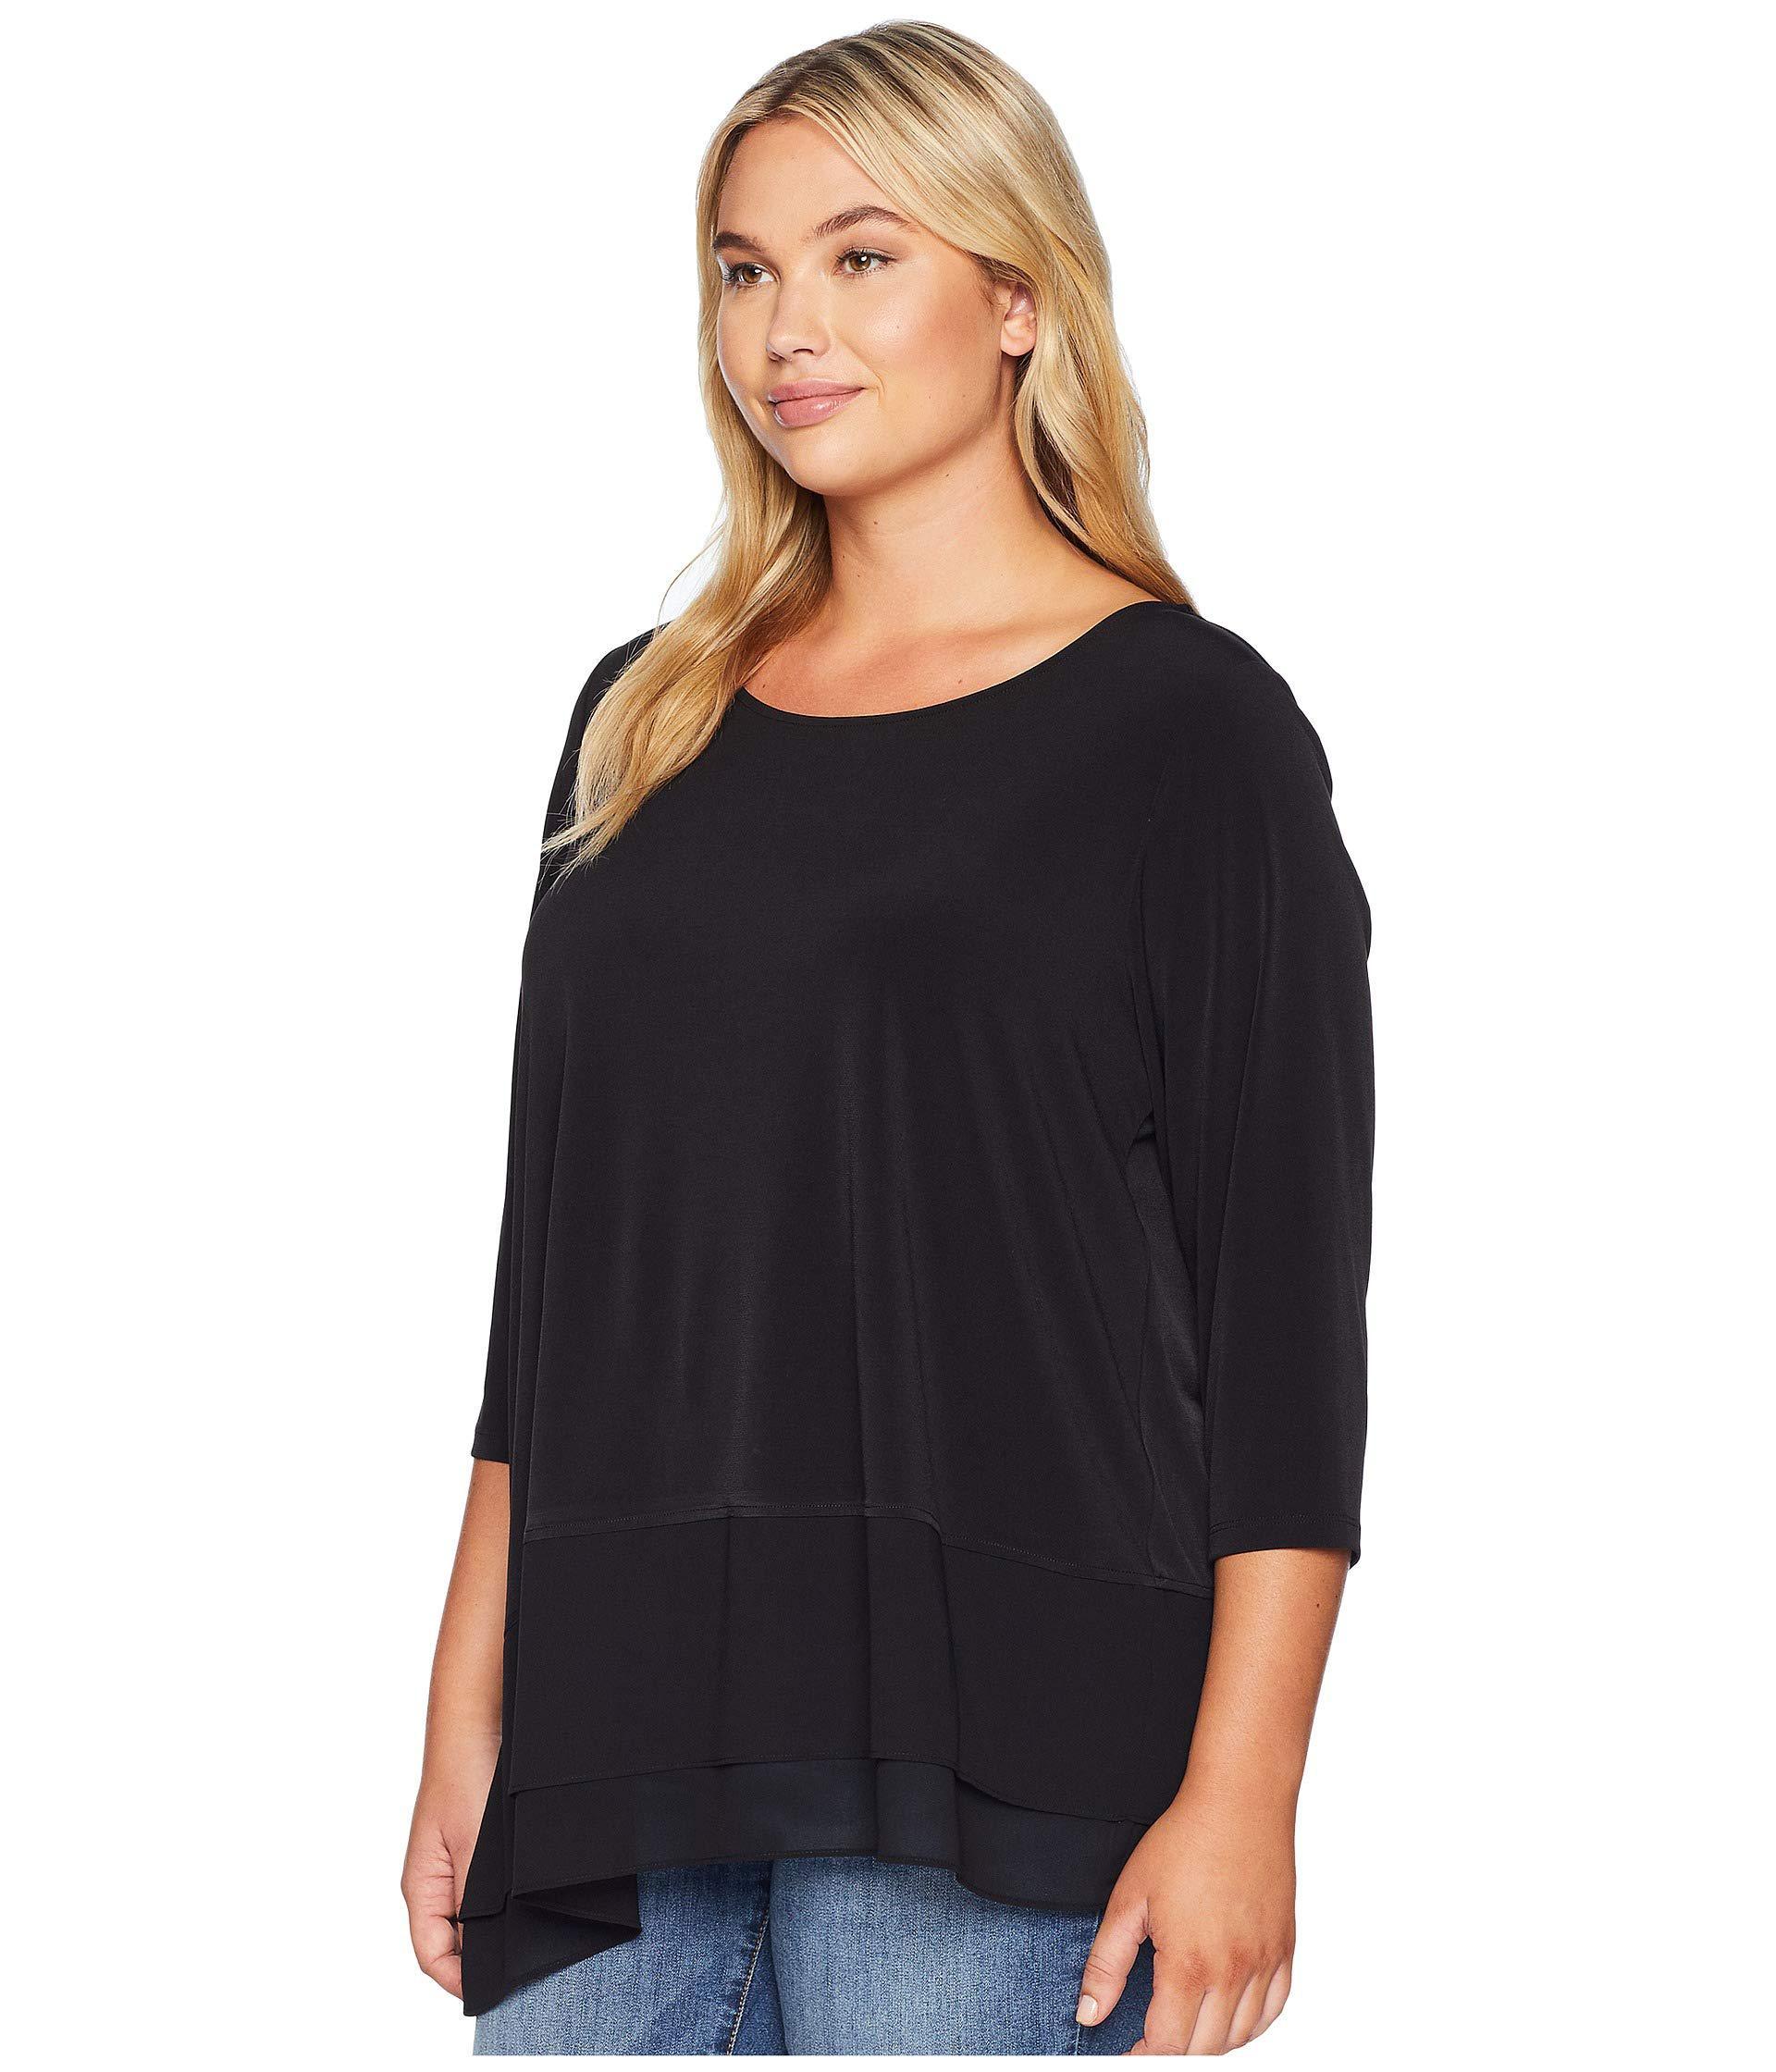 fcd7cc97c7b7e Lyst - Calvin Klein Plus Size 3 4 Sleeve Top Asymmetrical Hem in Black